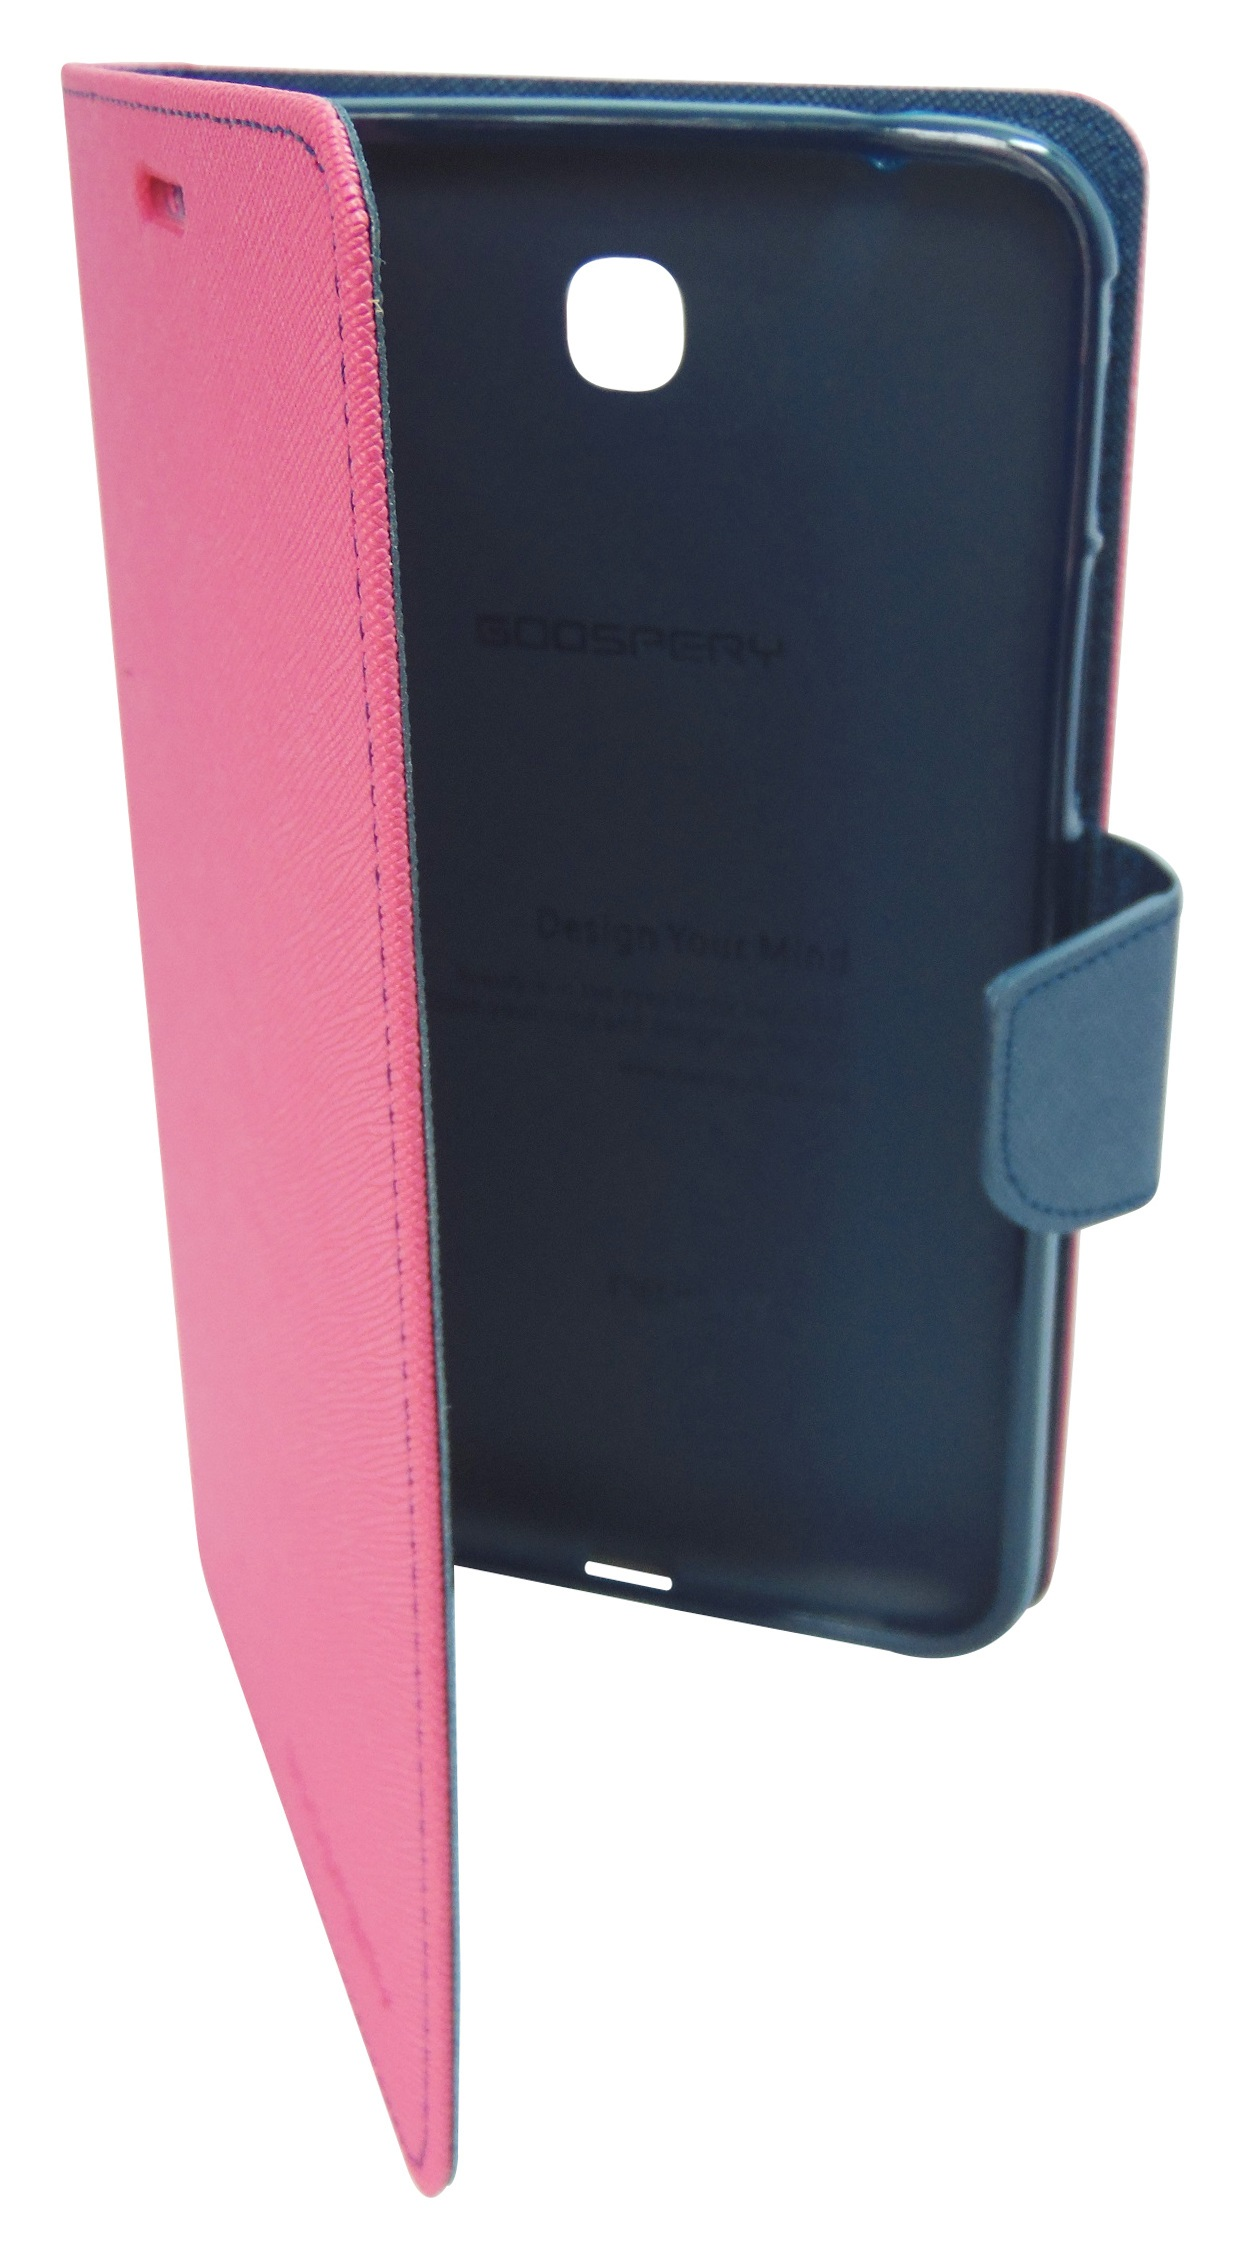 Husa tip carte Mercury Goospery Fancy Diary roz + bleumarin pentru Samsung Galaxy Tab 3 P3200 (SM-T211) / P3210 (SM-T210)